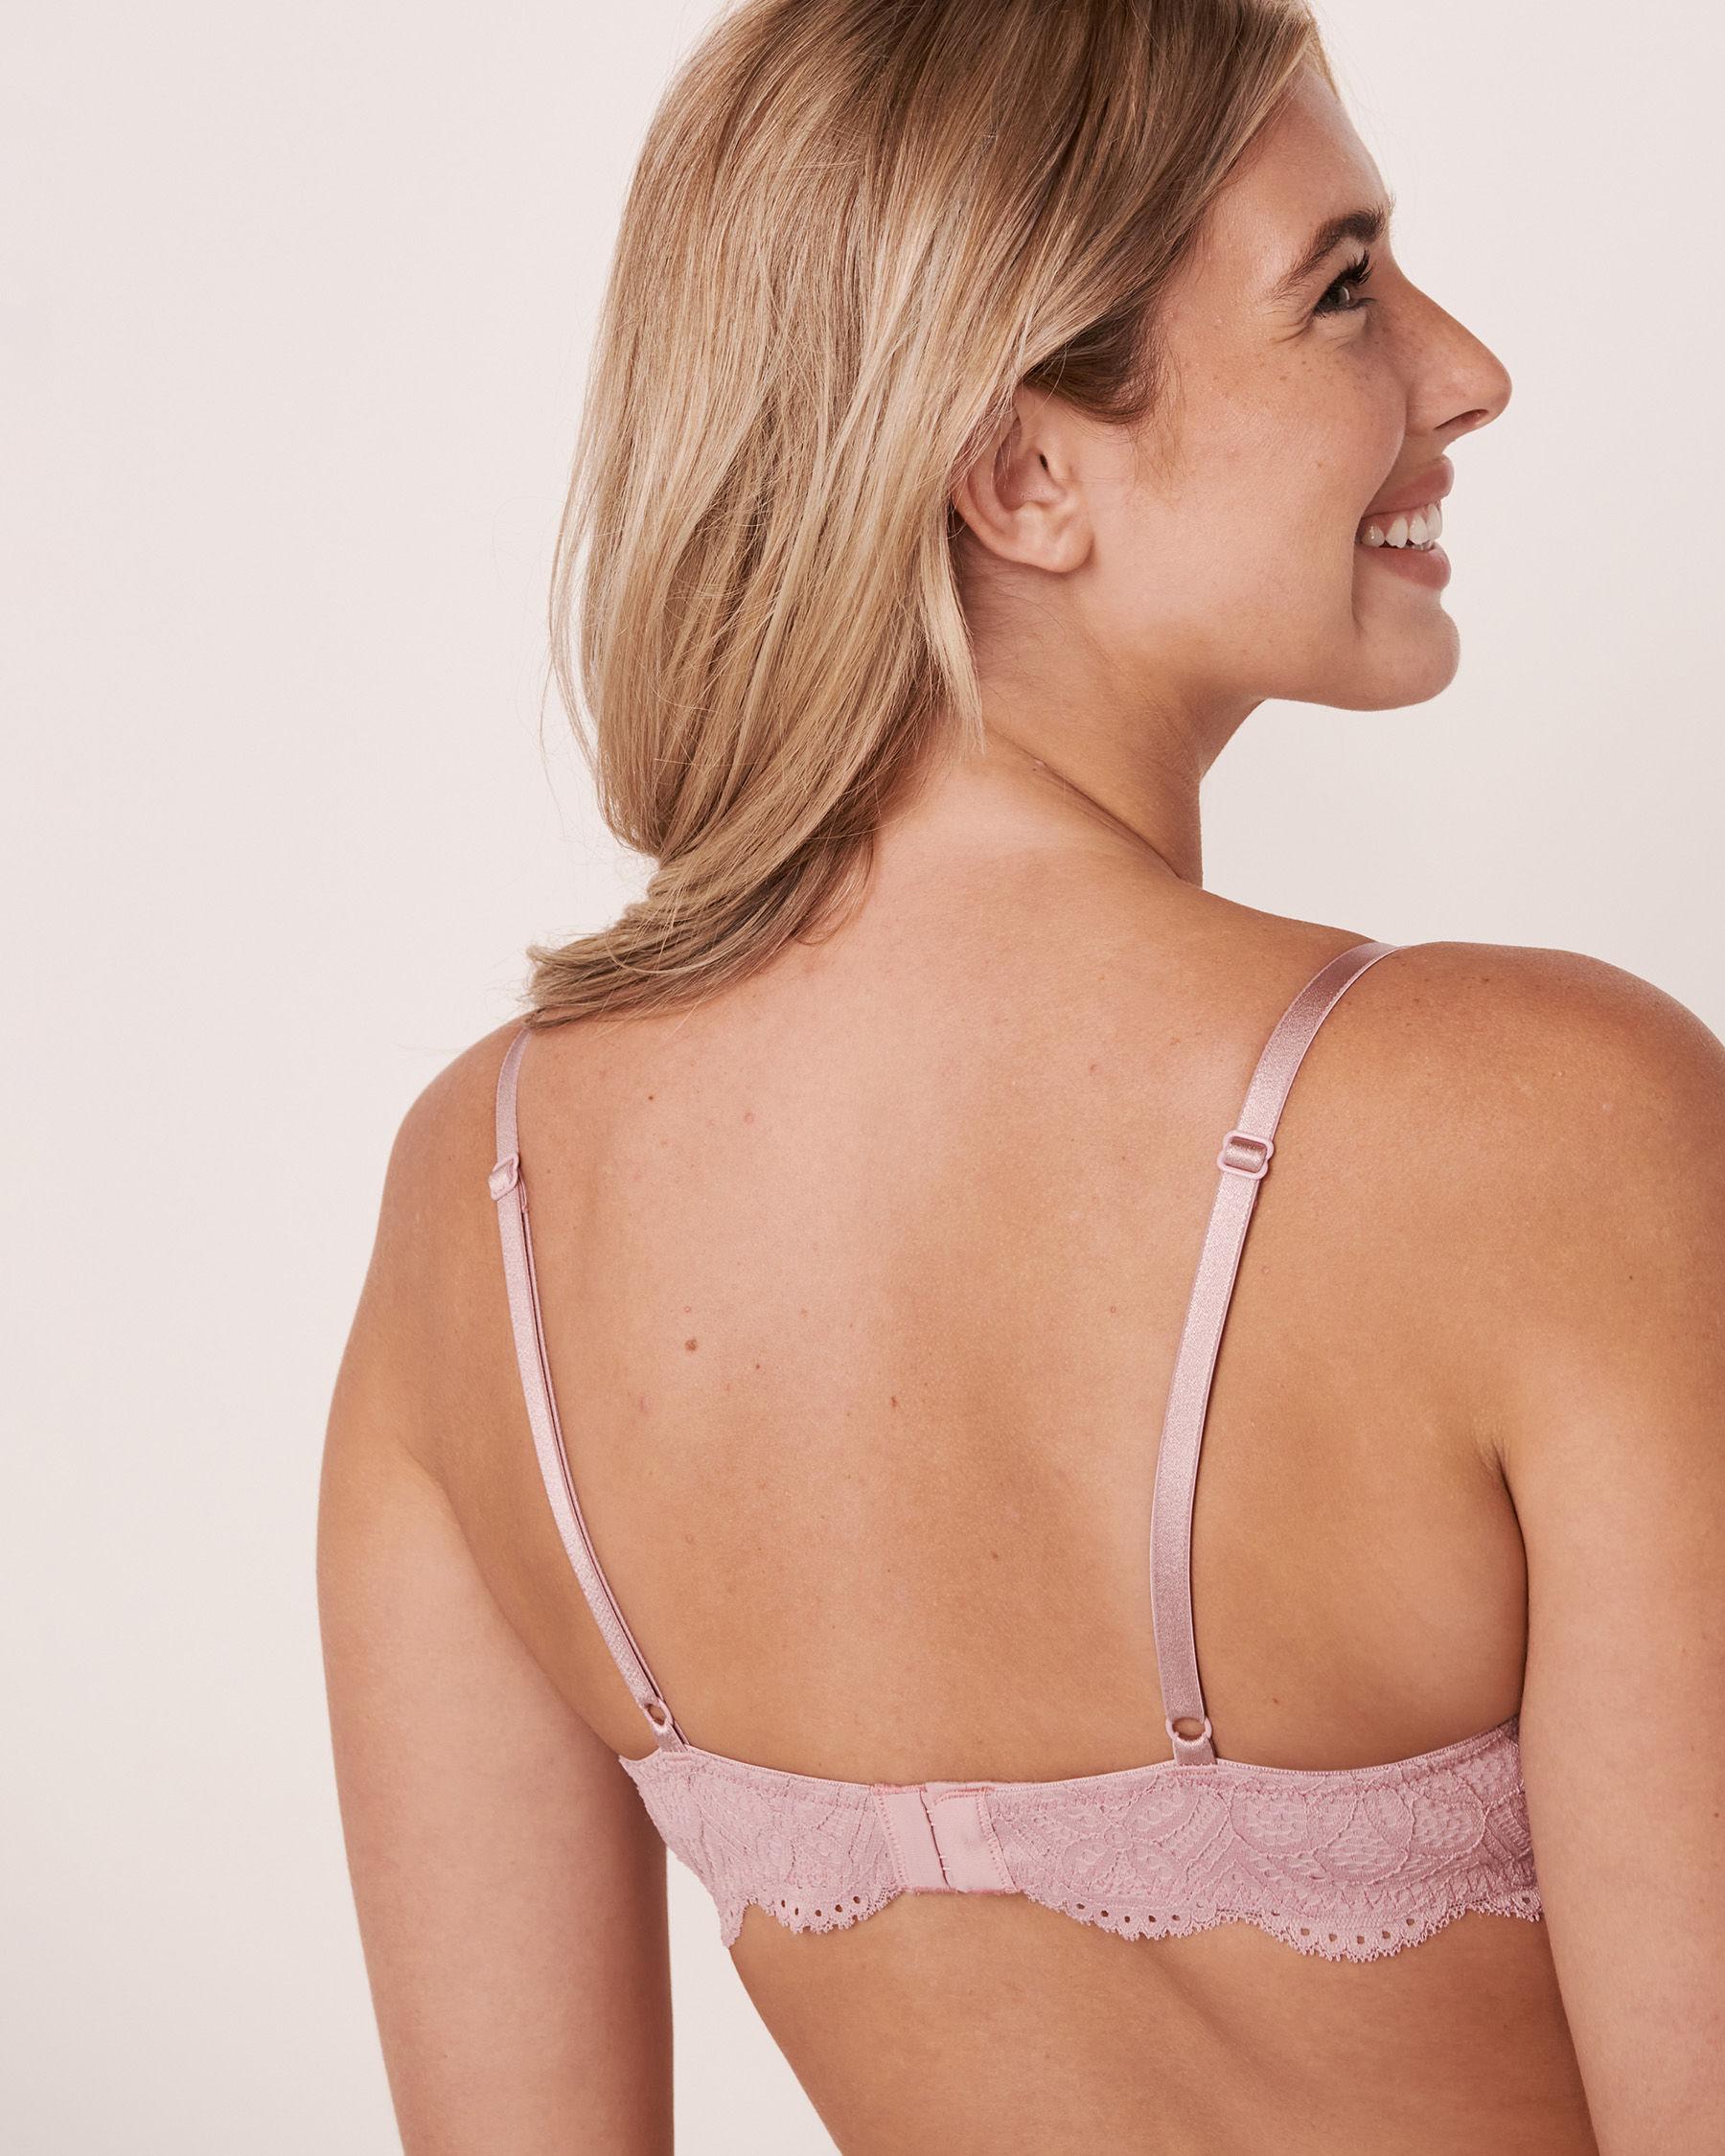 LA VIE EN ROSE Lightly Lined Demi Bra Pink shadows 10200069 - View6